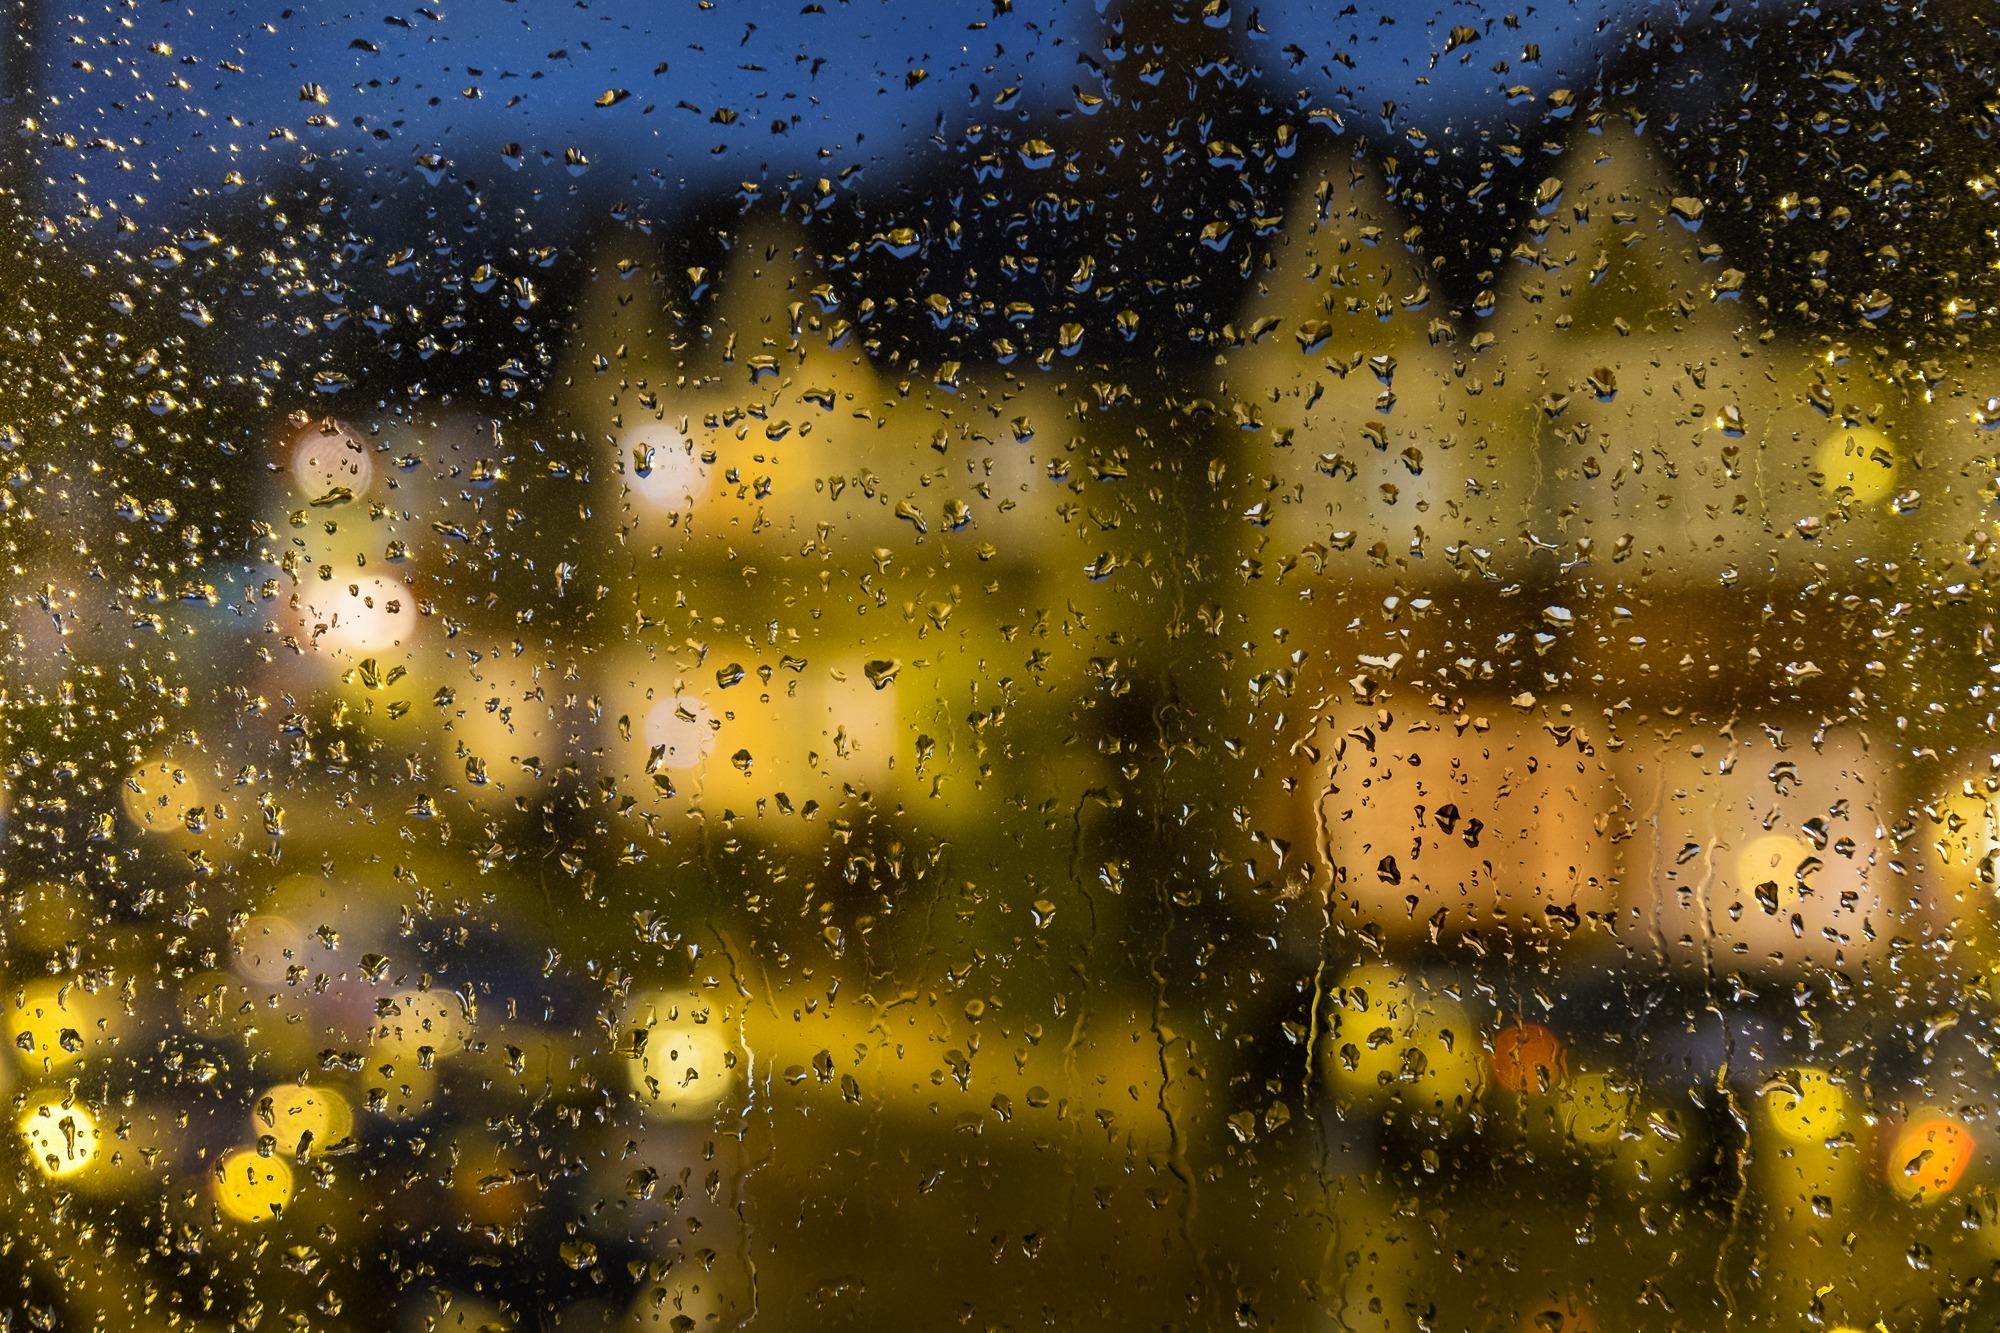 Rainy Night in Whitton